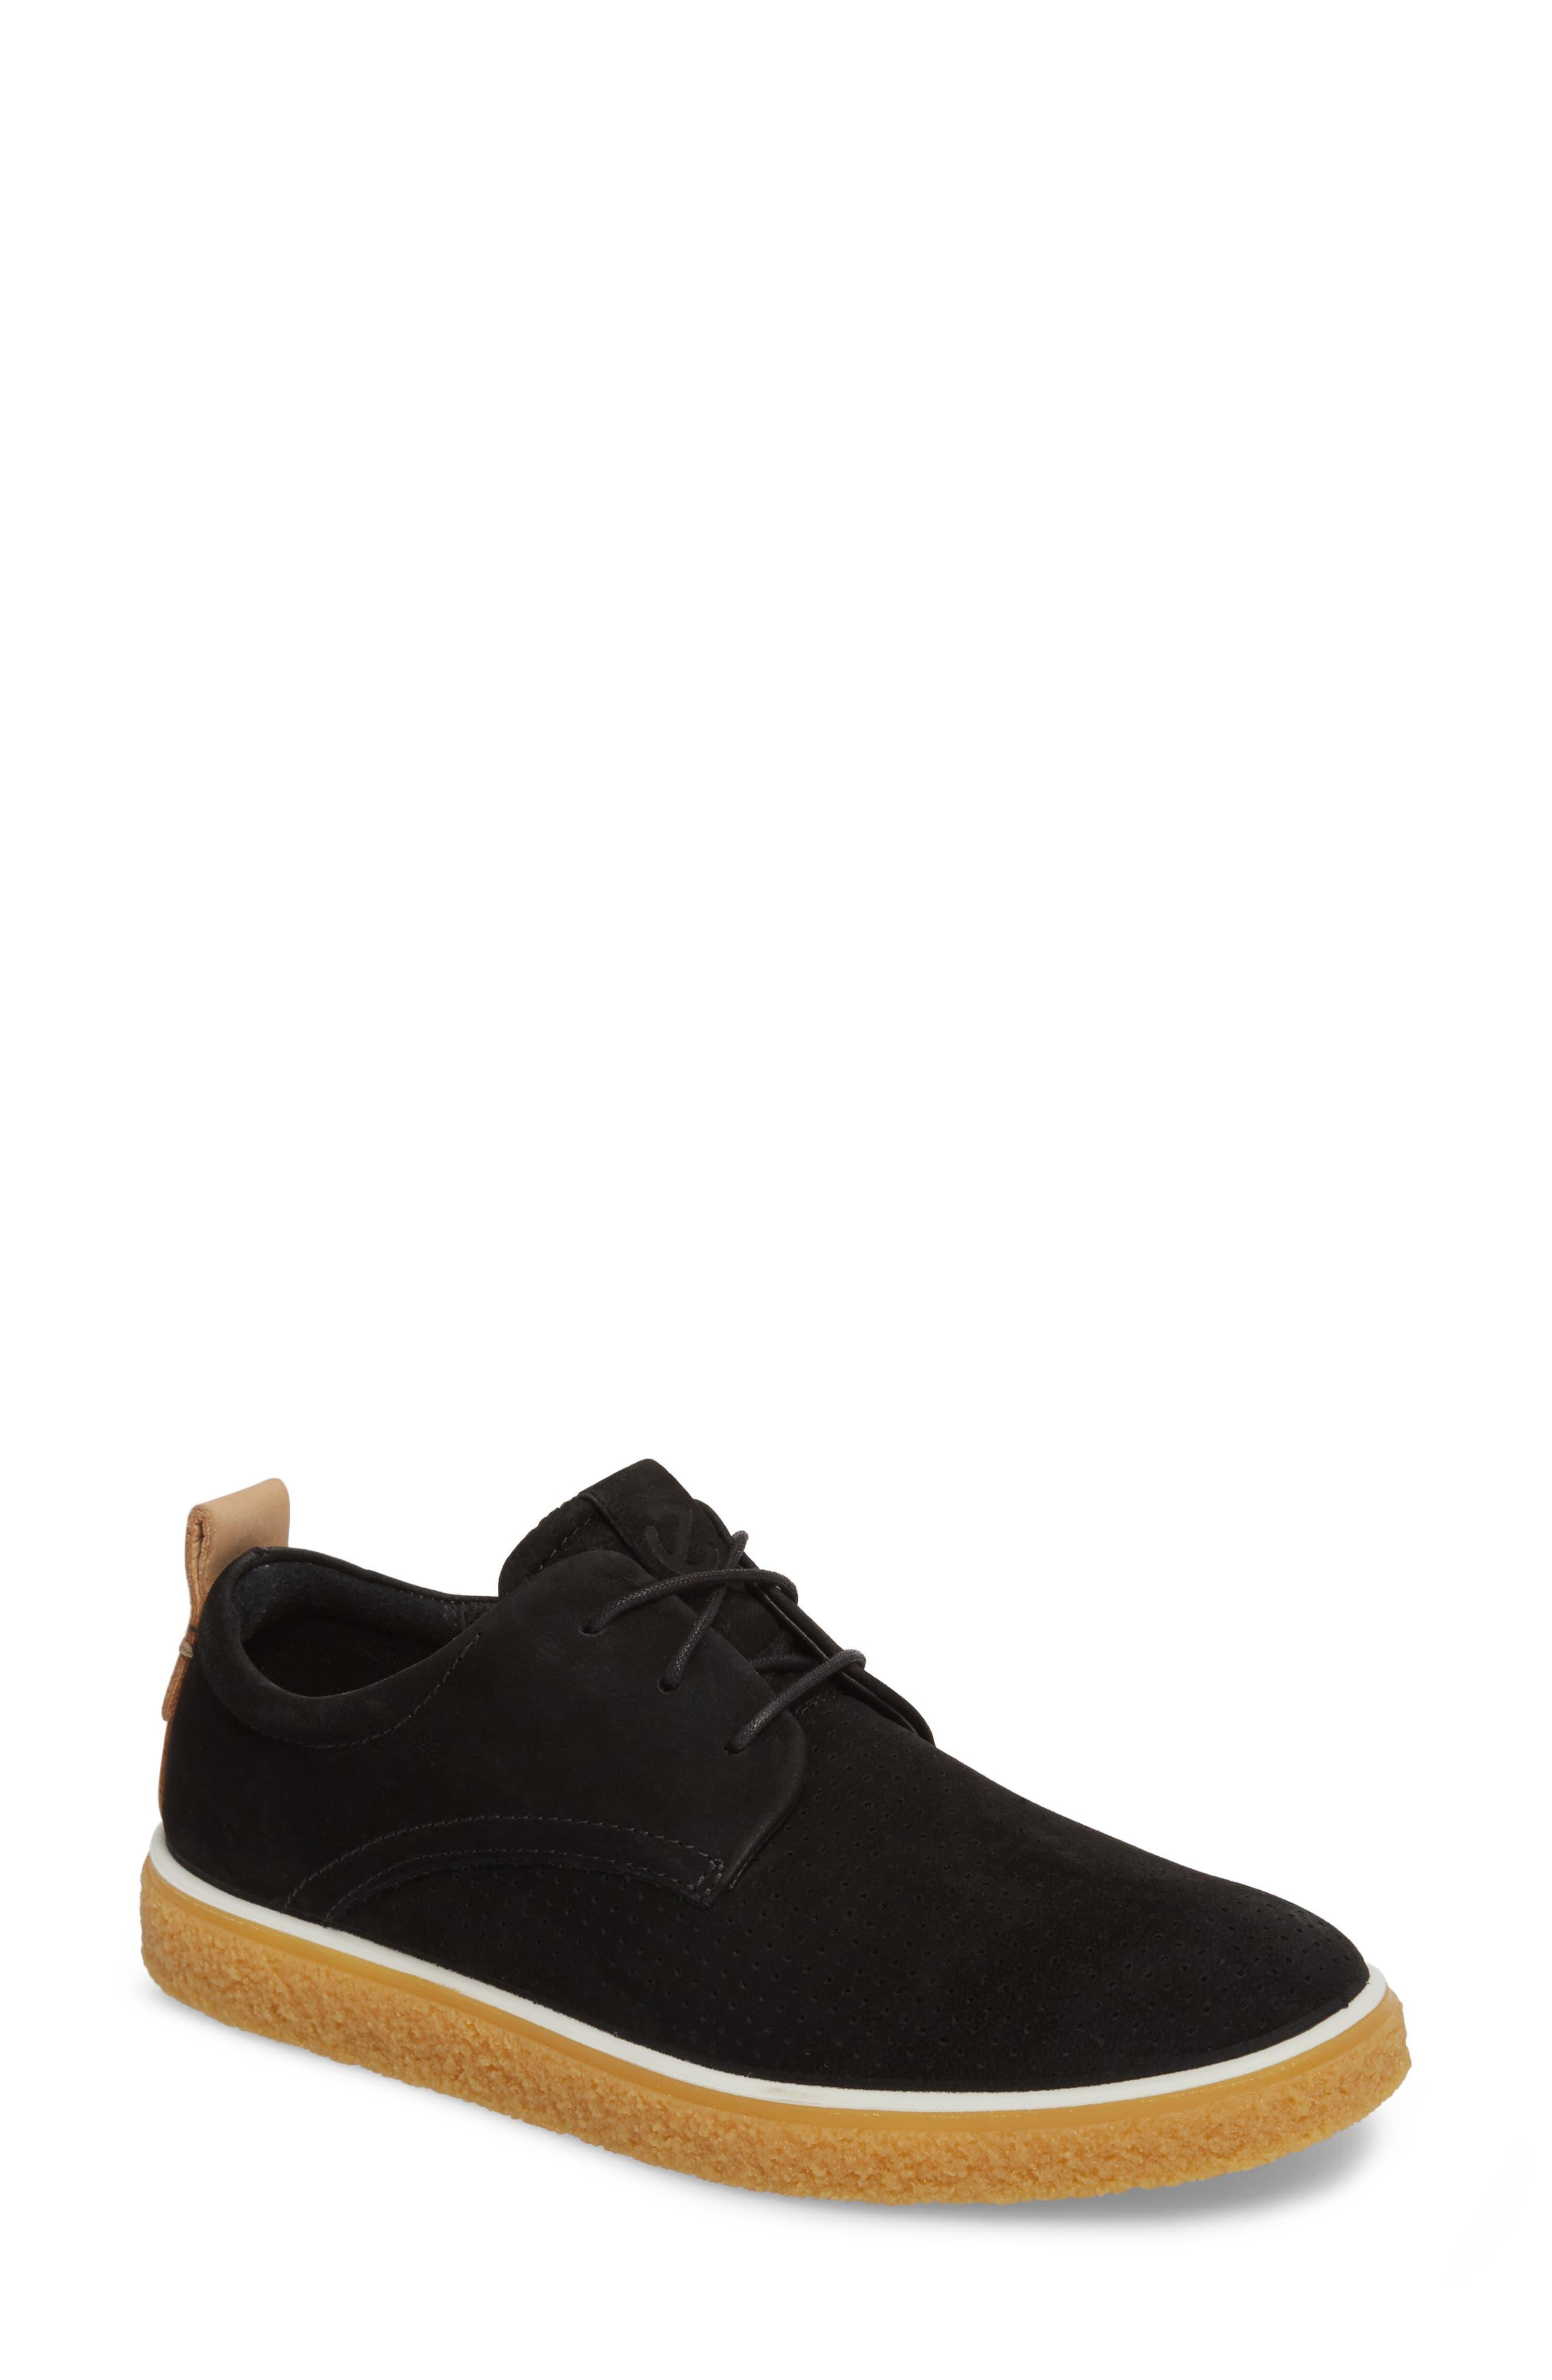 Crepetray Sneaker,                             Main thumbnail 1, color,                             009